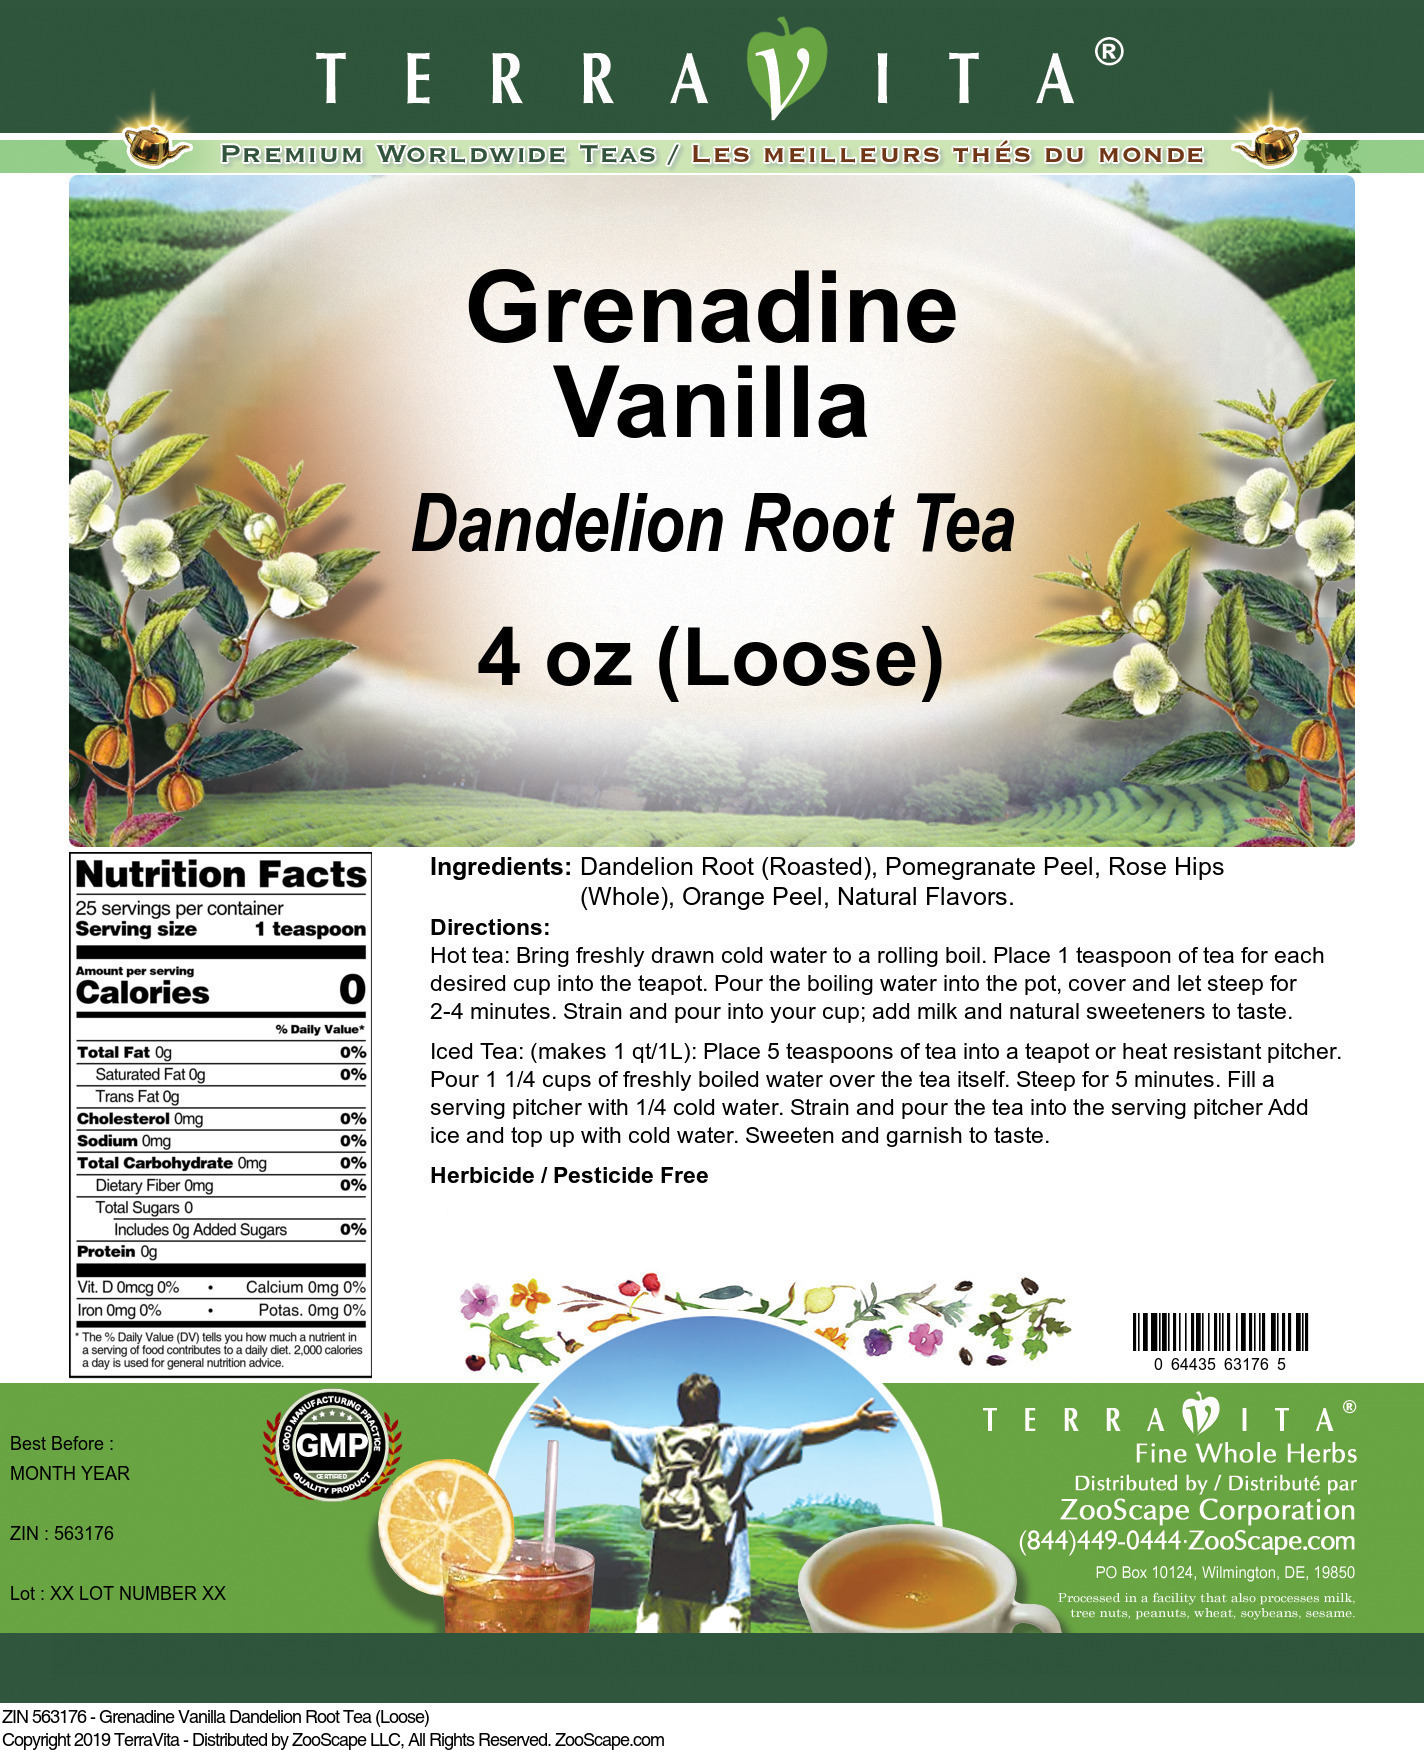 Grenadine Vanilla Dandelion Root Tea (Loose)